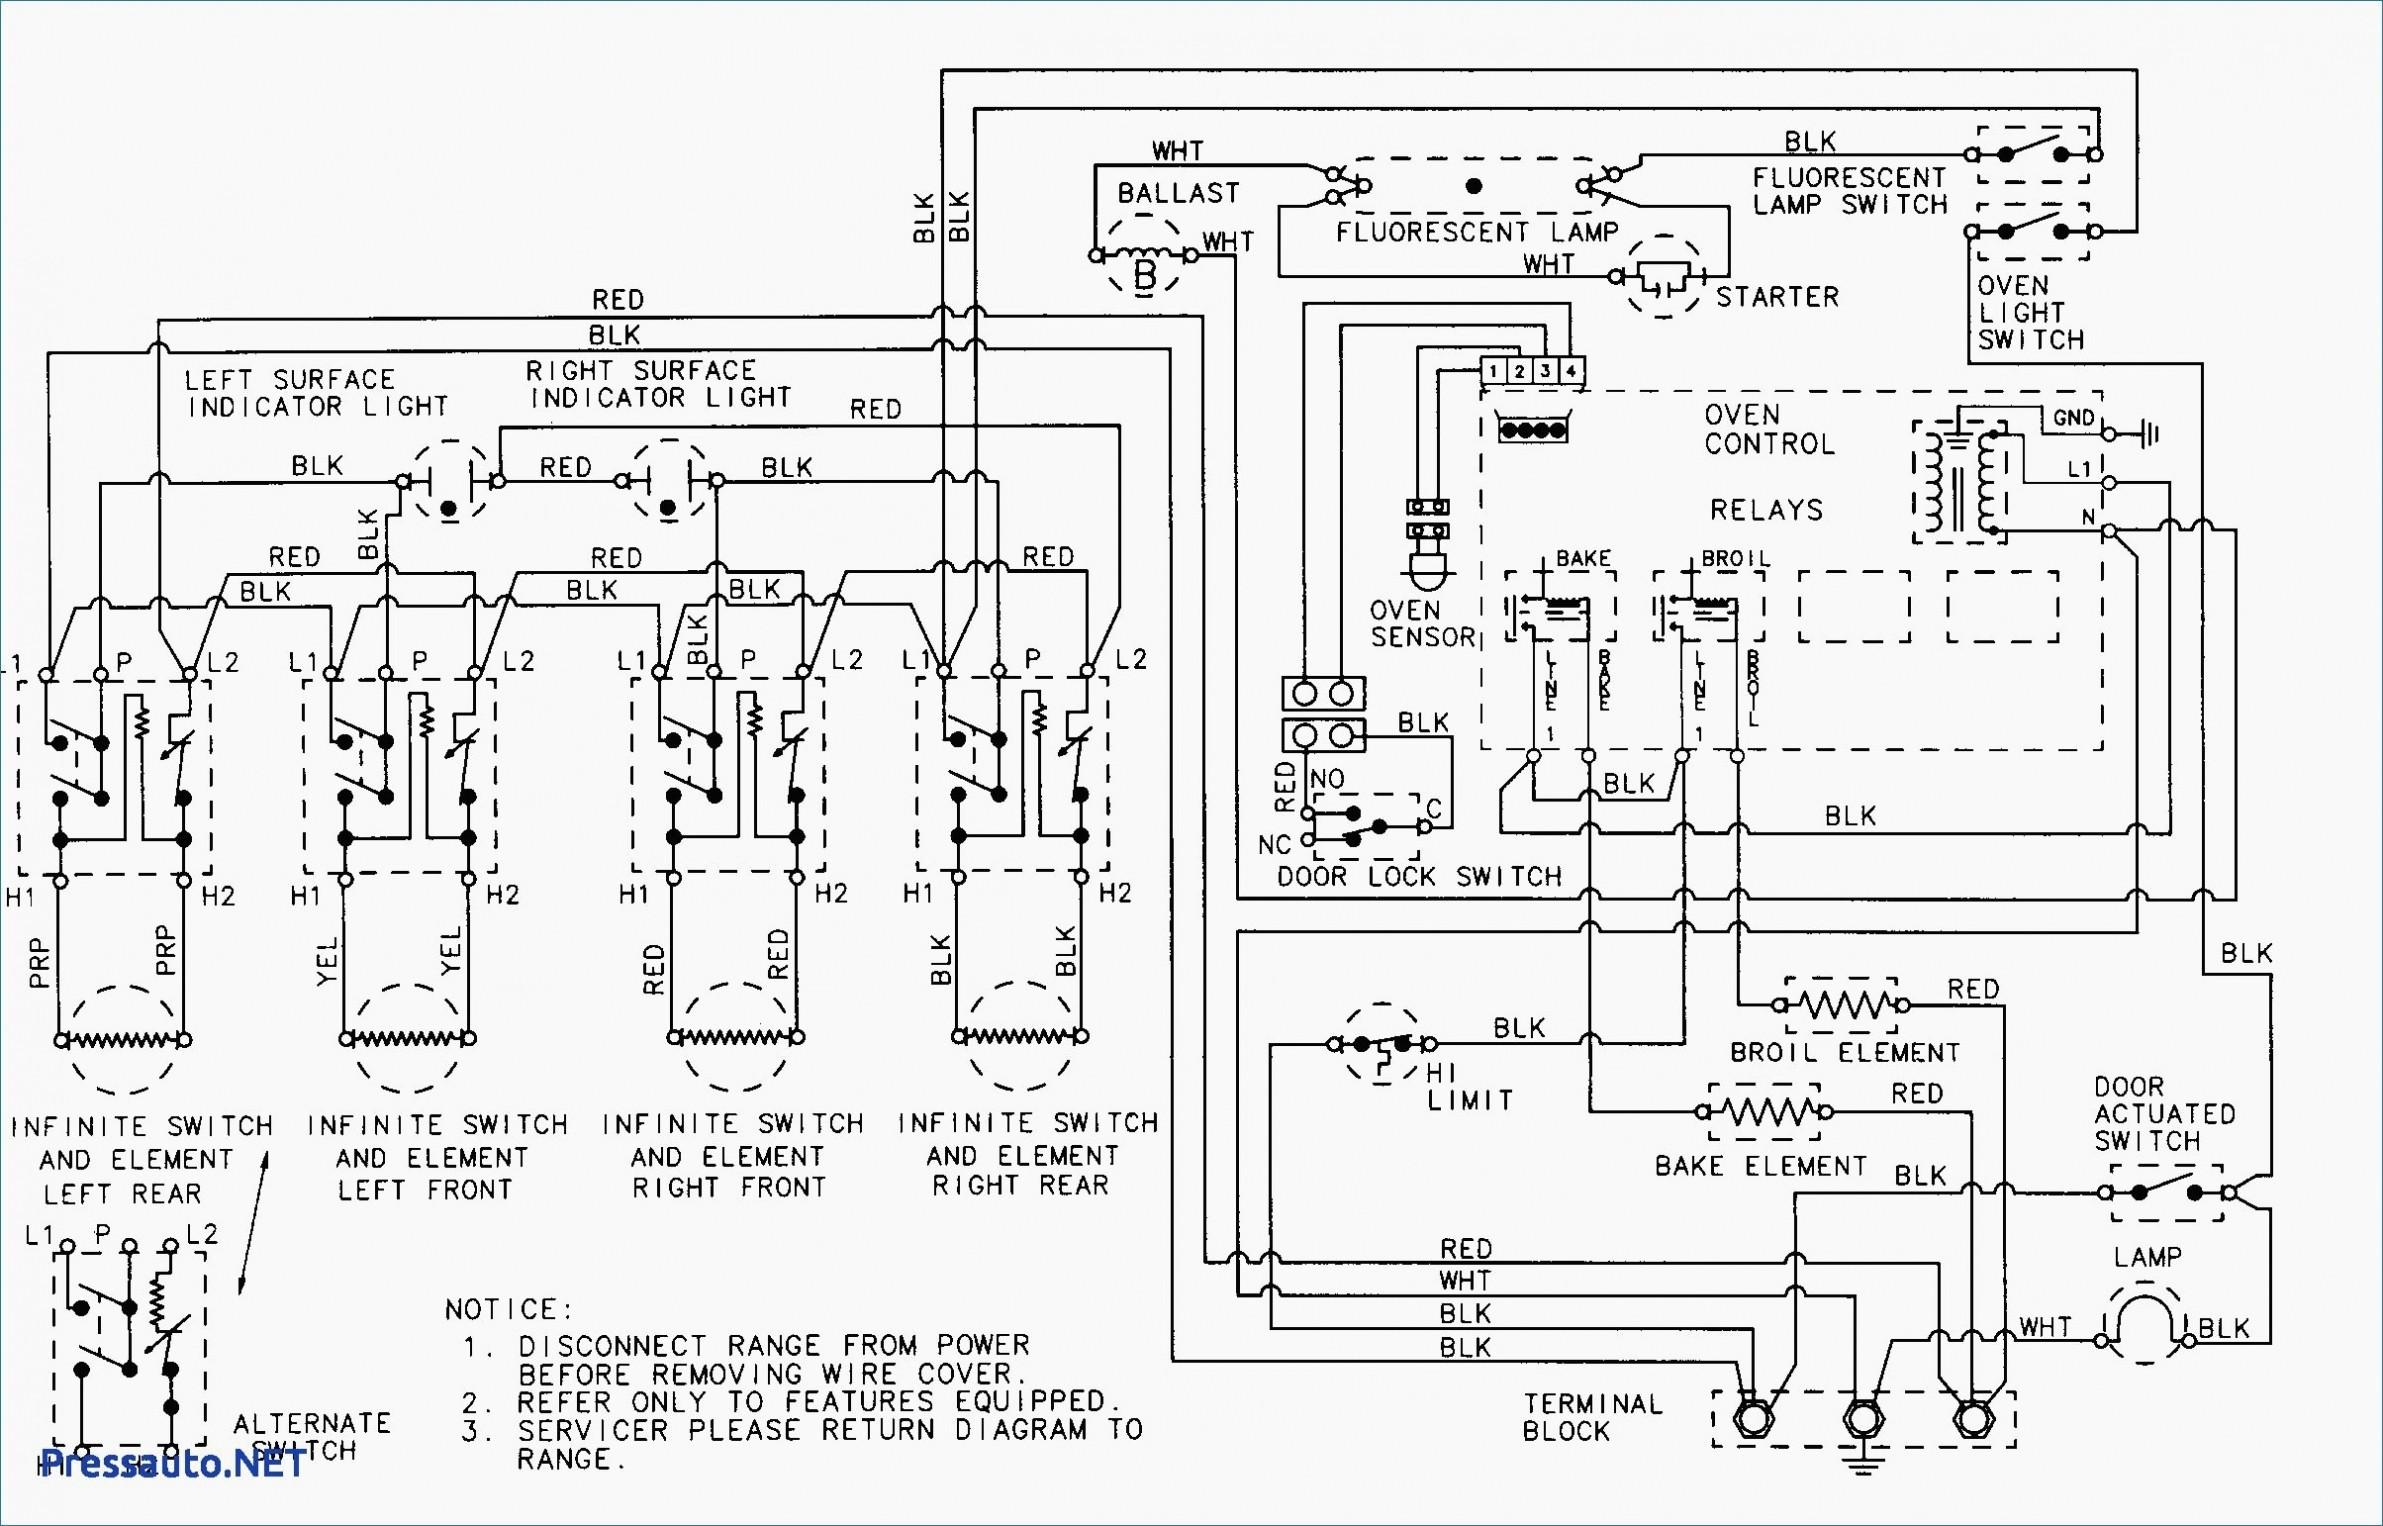 5915 Pioneer Deh 1300mp Wiring Diagram Pioneer Deh 1300mp Wiring Wiring Library